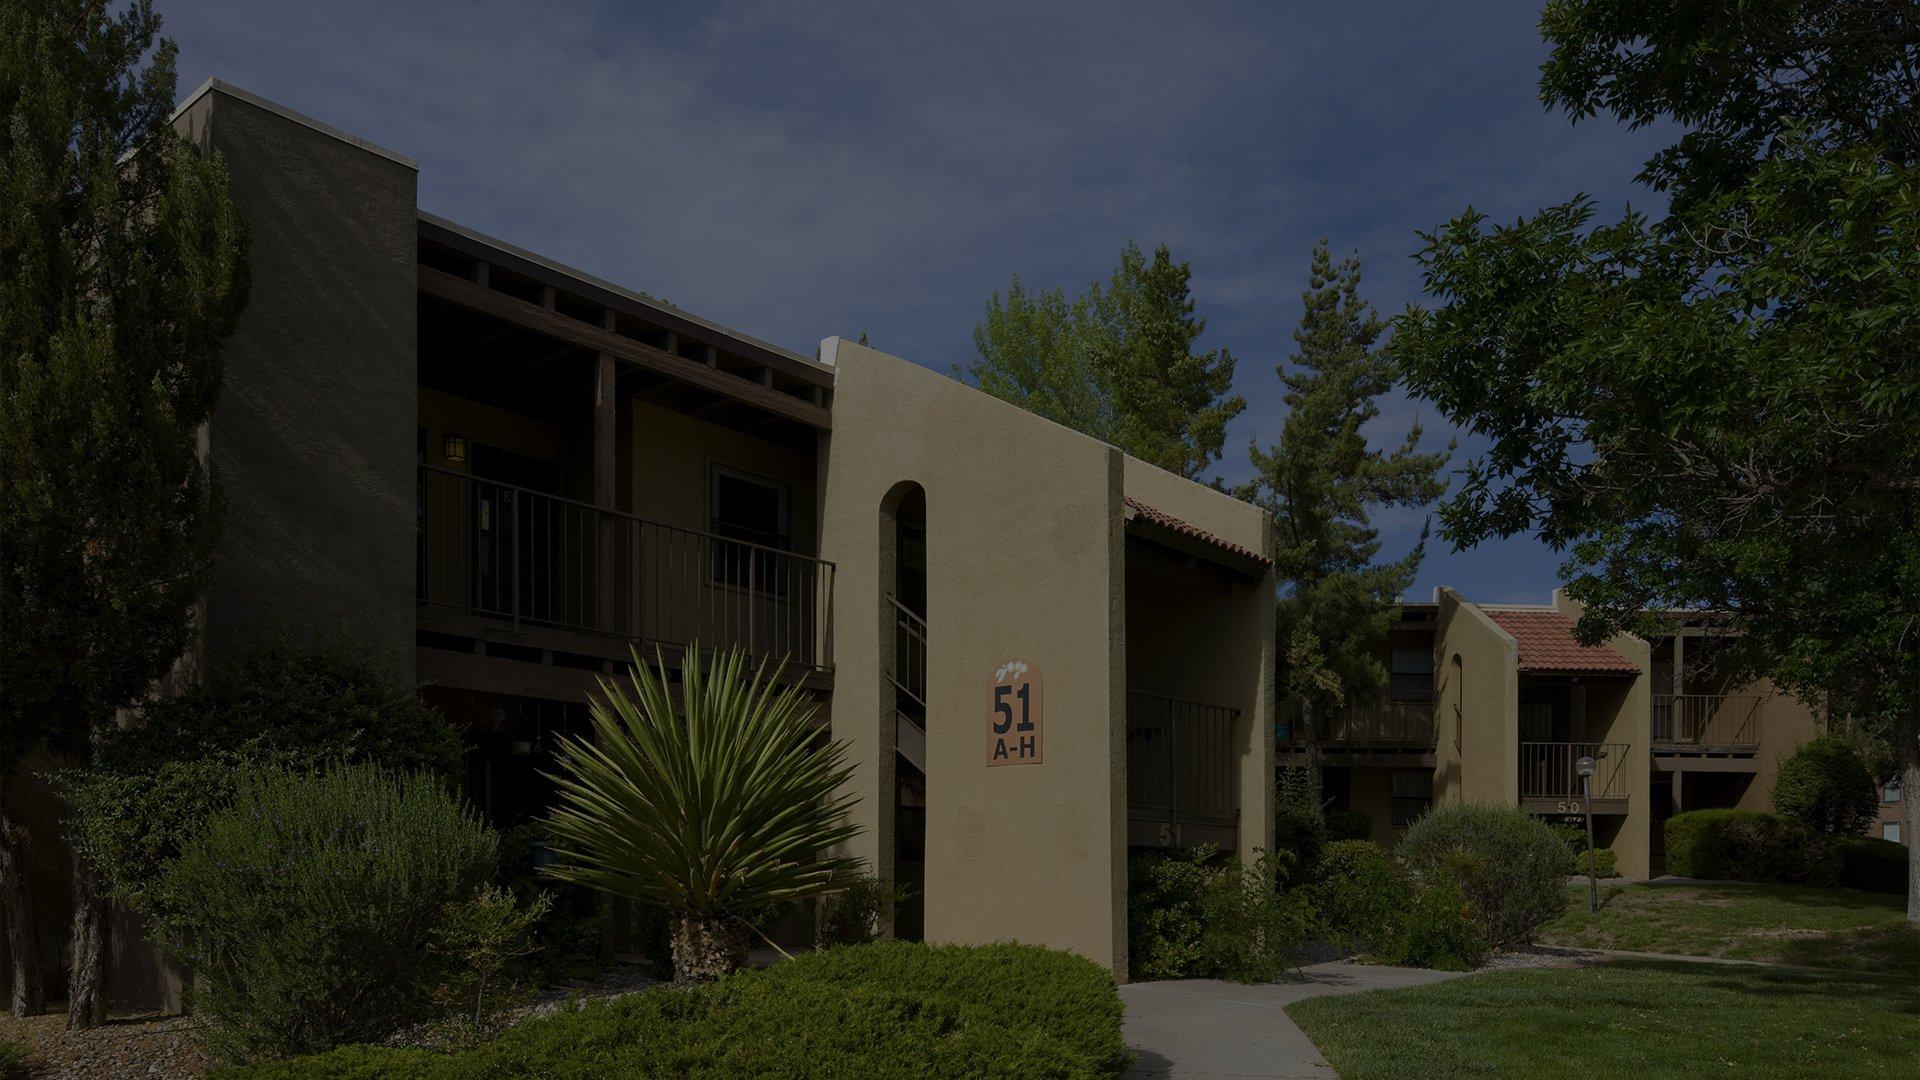 Spain Gardens Apartments | Albuquerque Apartments ...